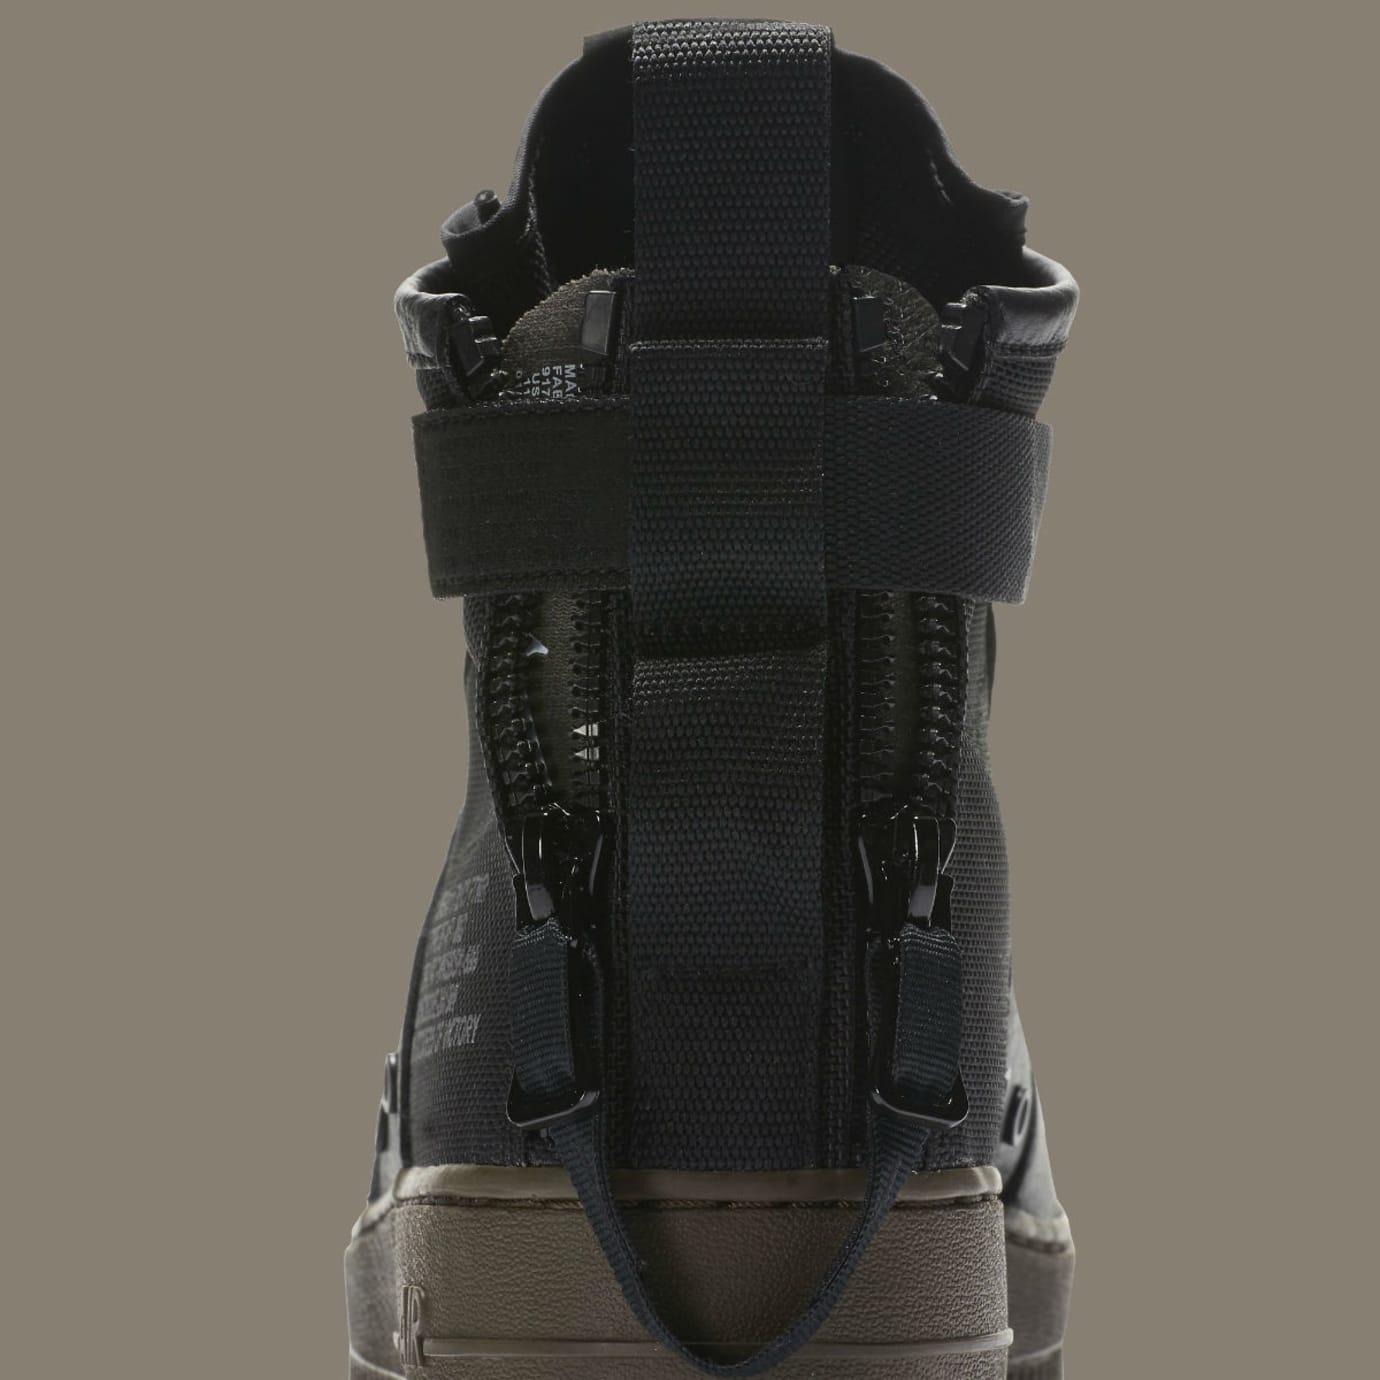 Nike SF Air Force 1 Mid Cargo Khaki Release Date Detail 917753-002